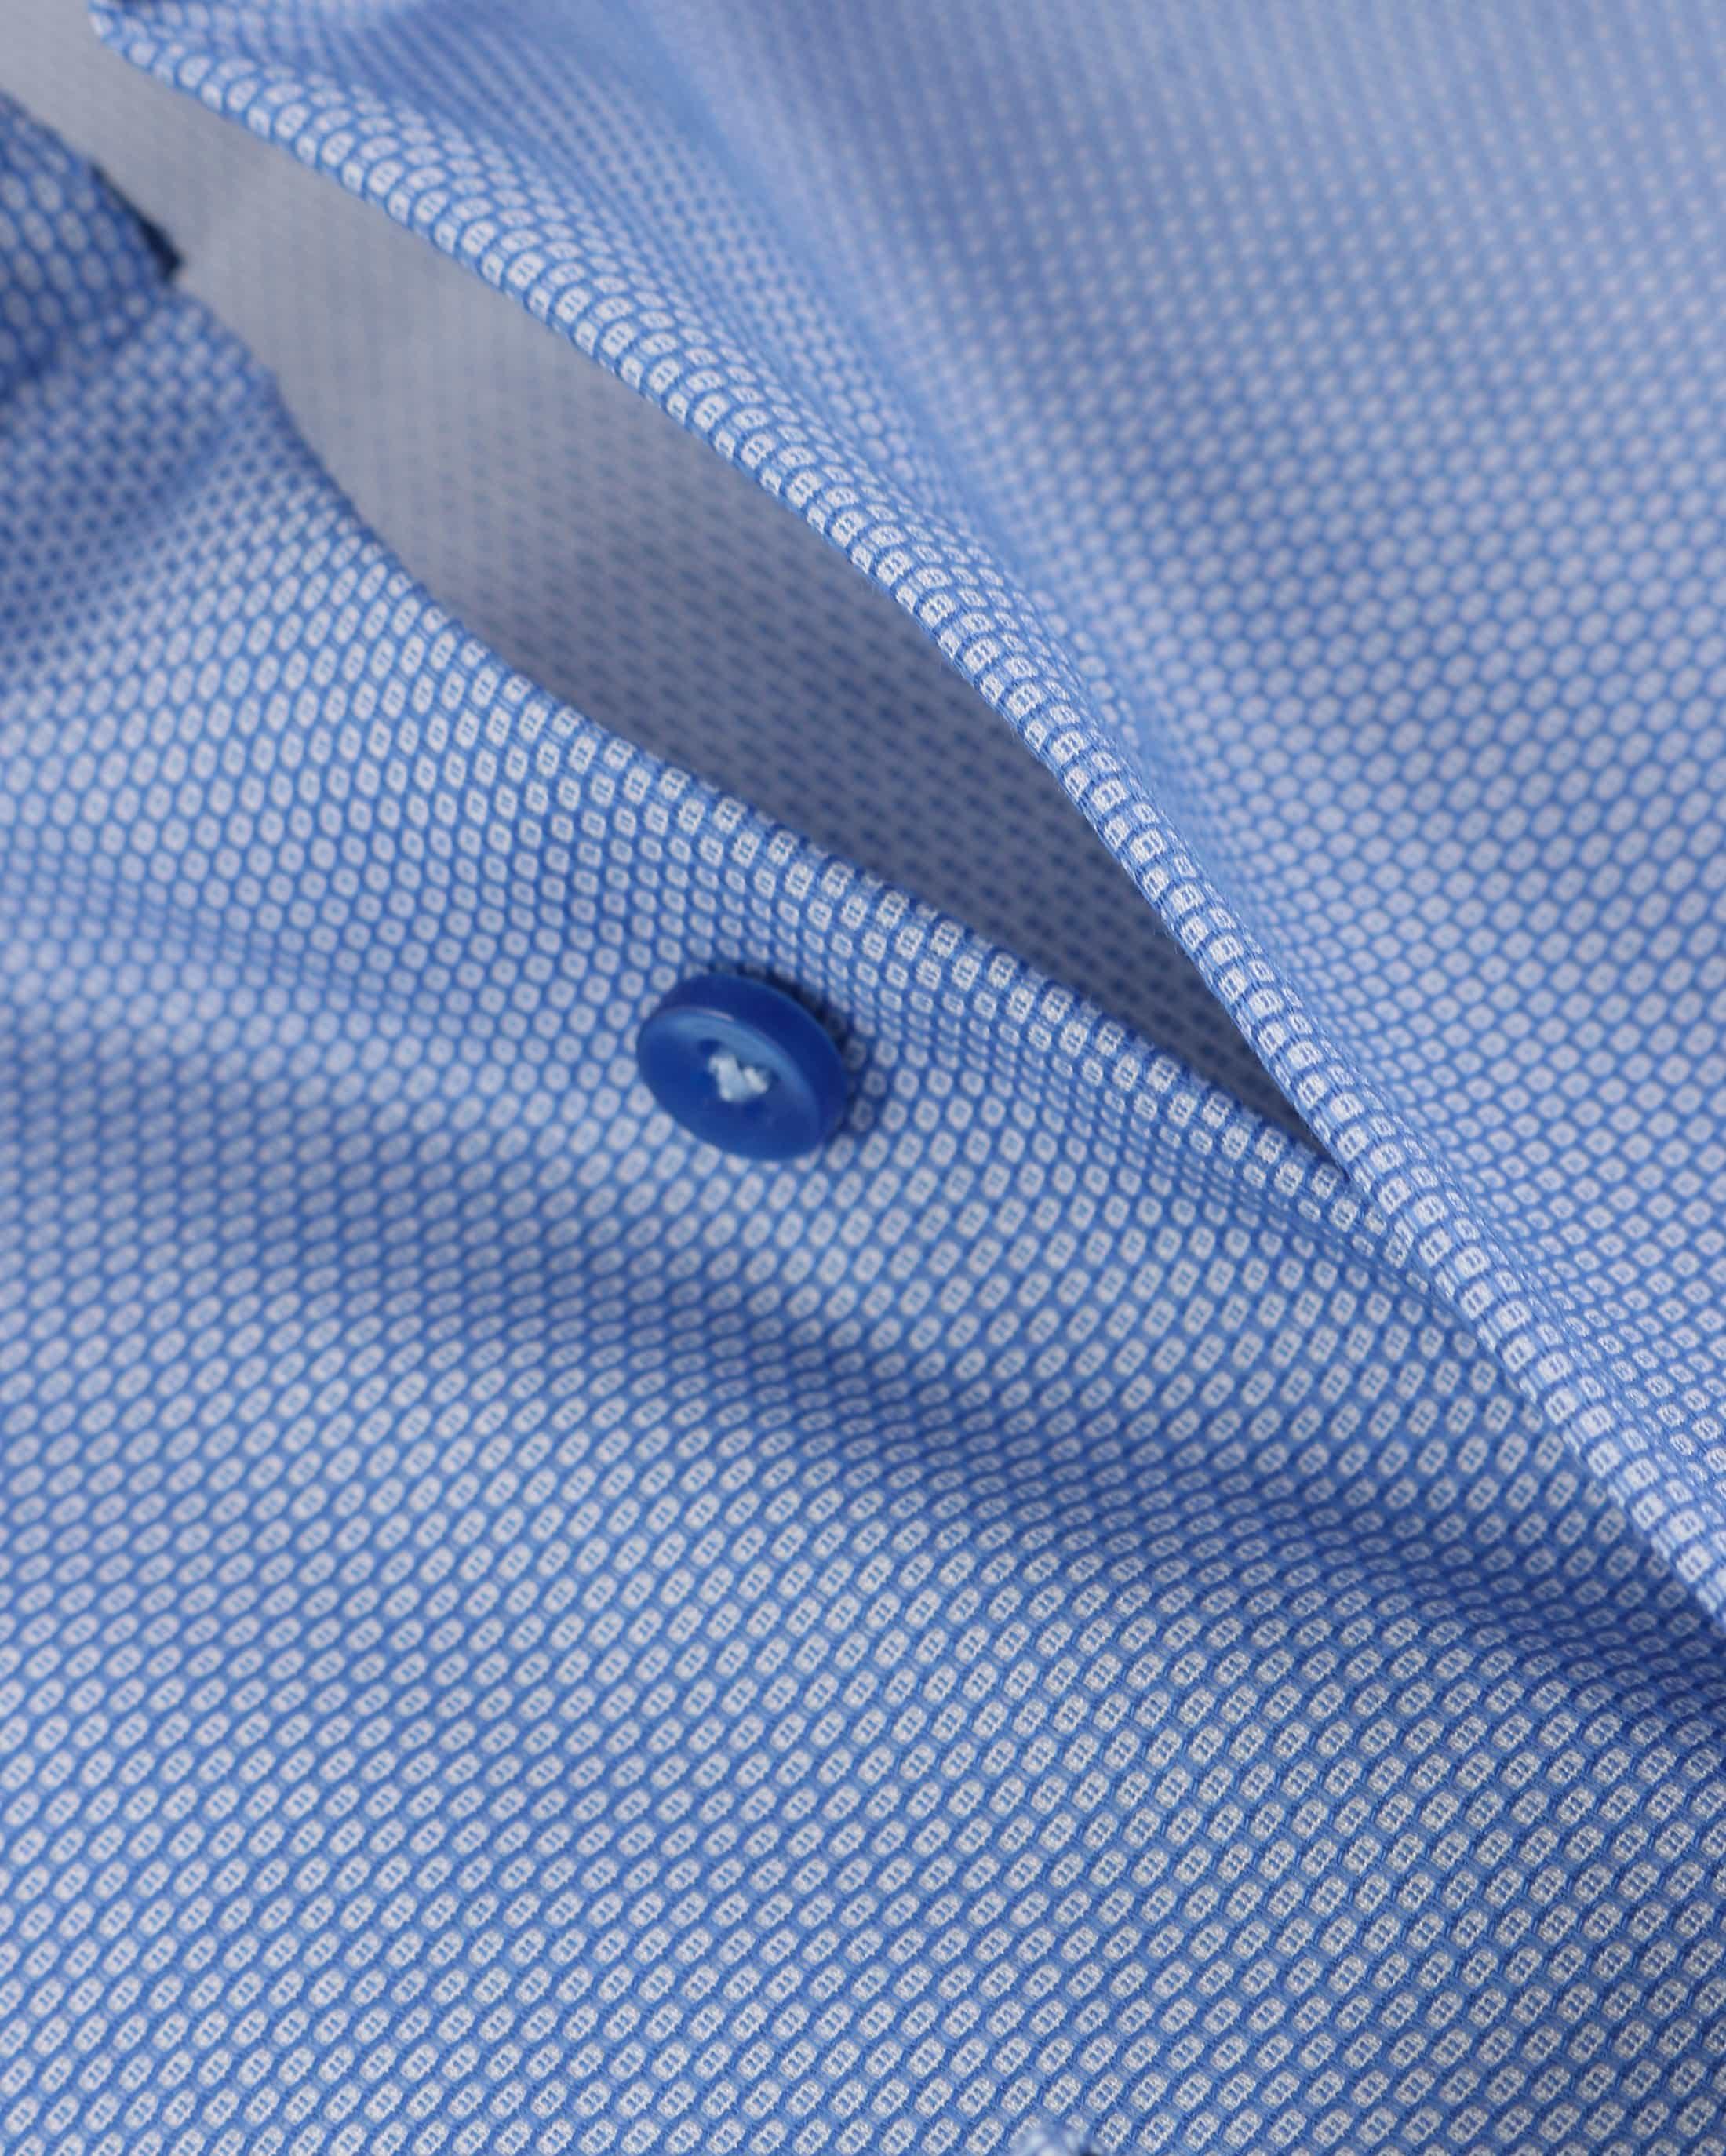 Mouwlengte 7 Overhemd Blauw 150-3 foto 3